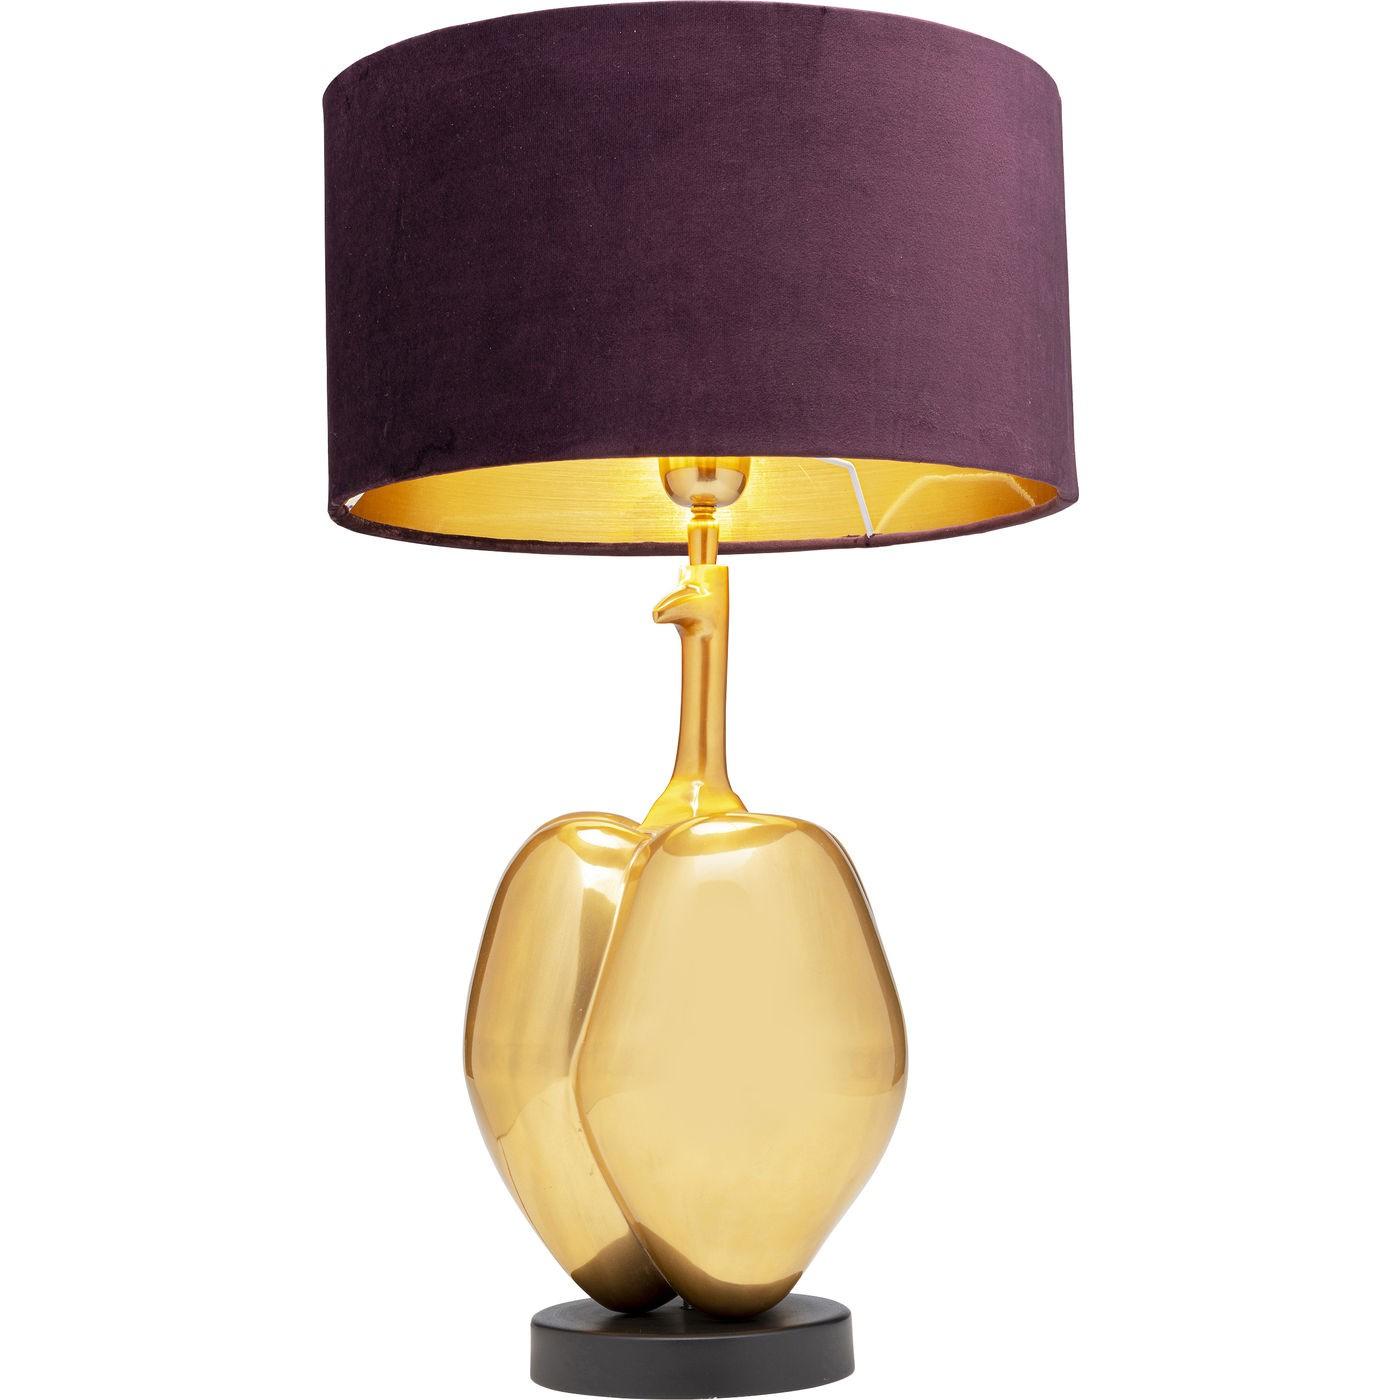 Lampe de table Pumpkin dorée Kare Design